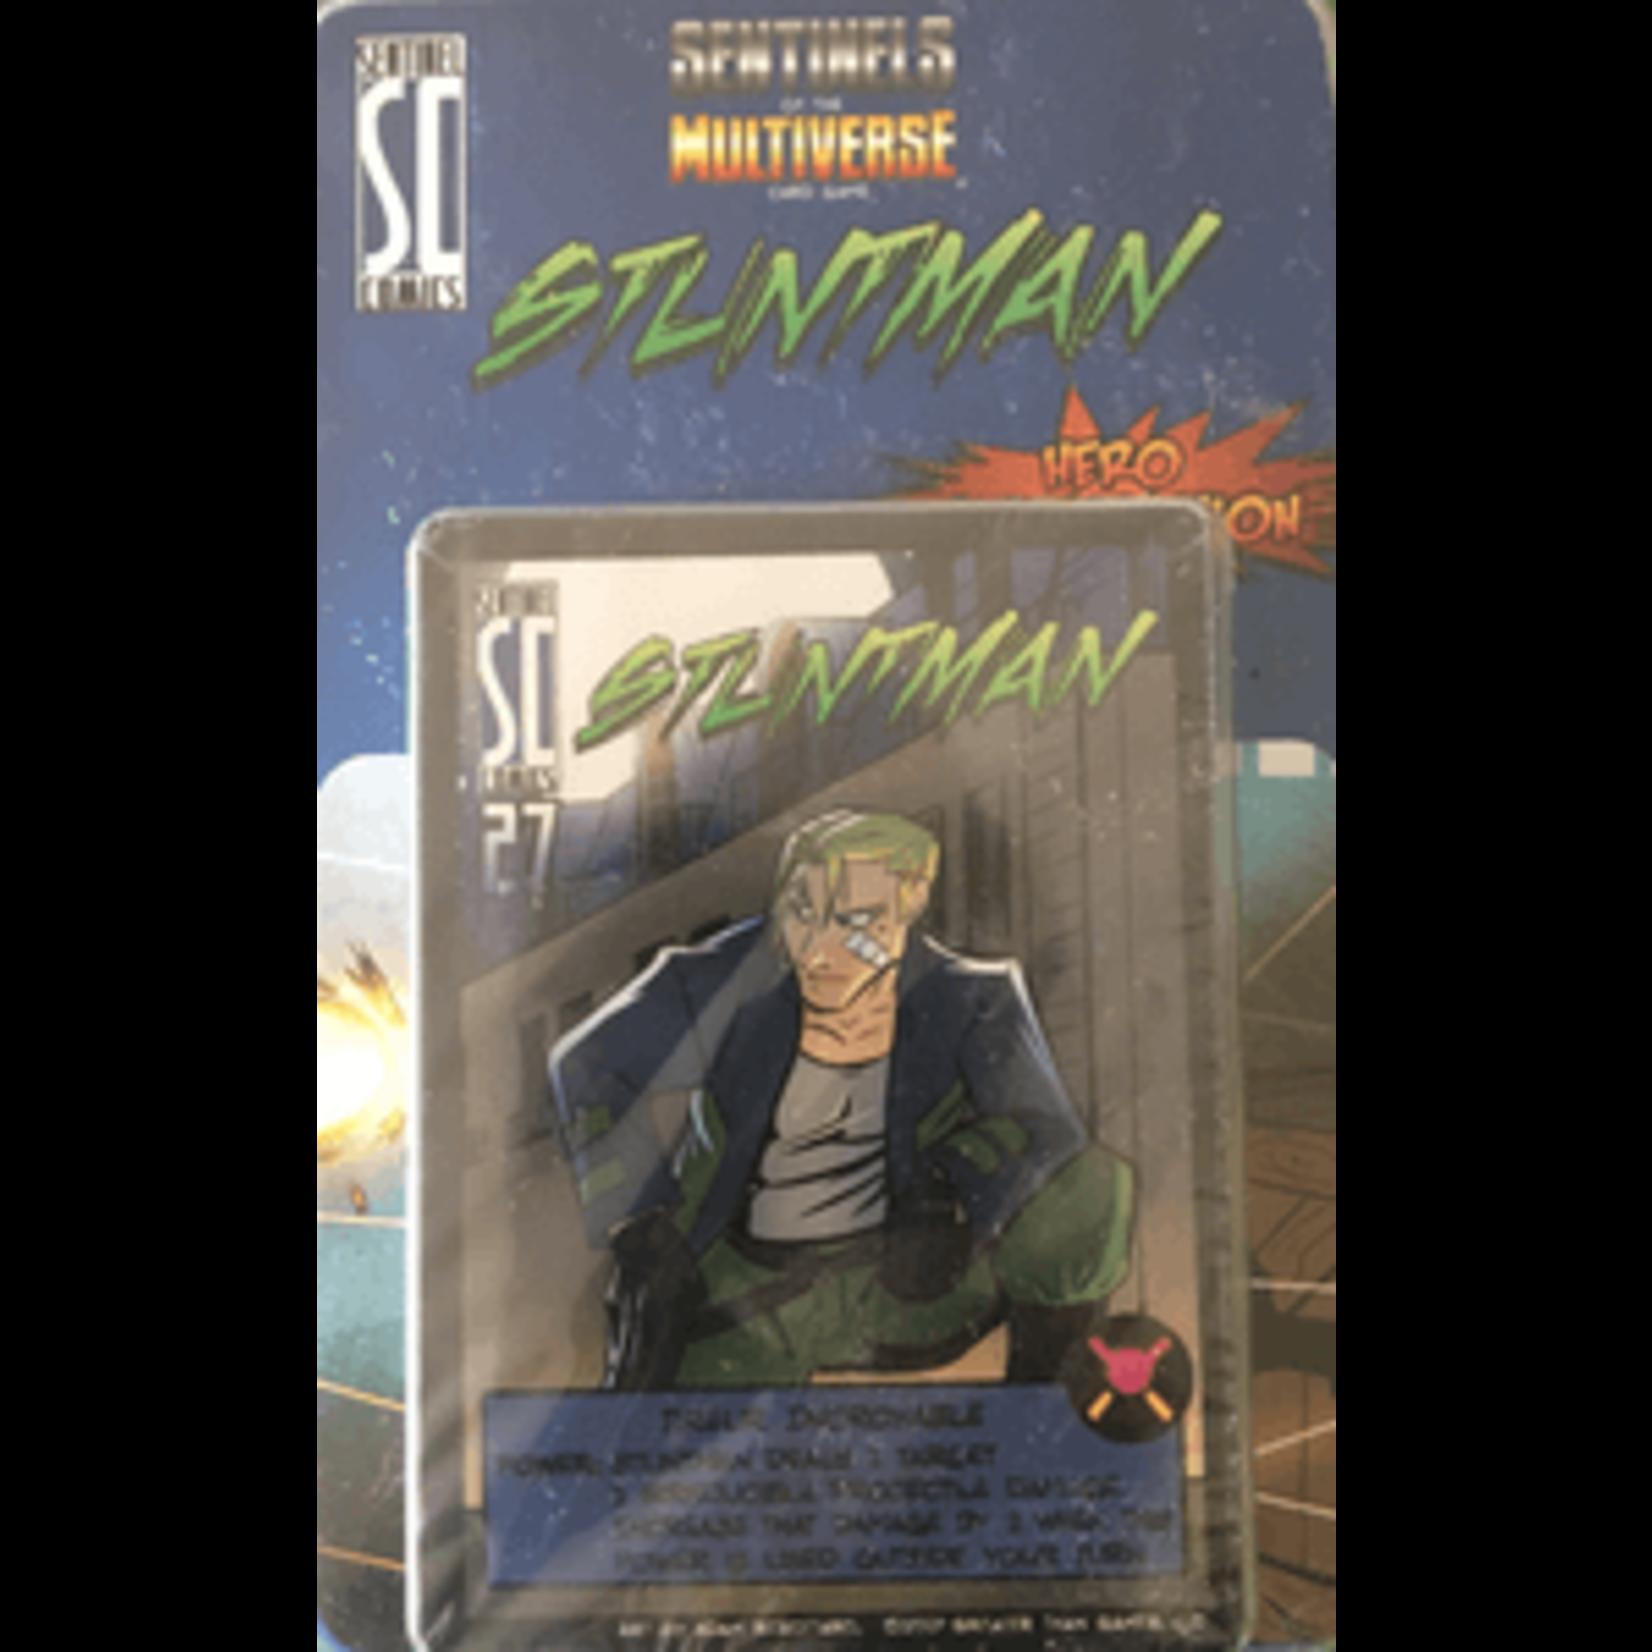 Sentinels of the Multiverse: Stuntman Expansion